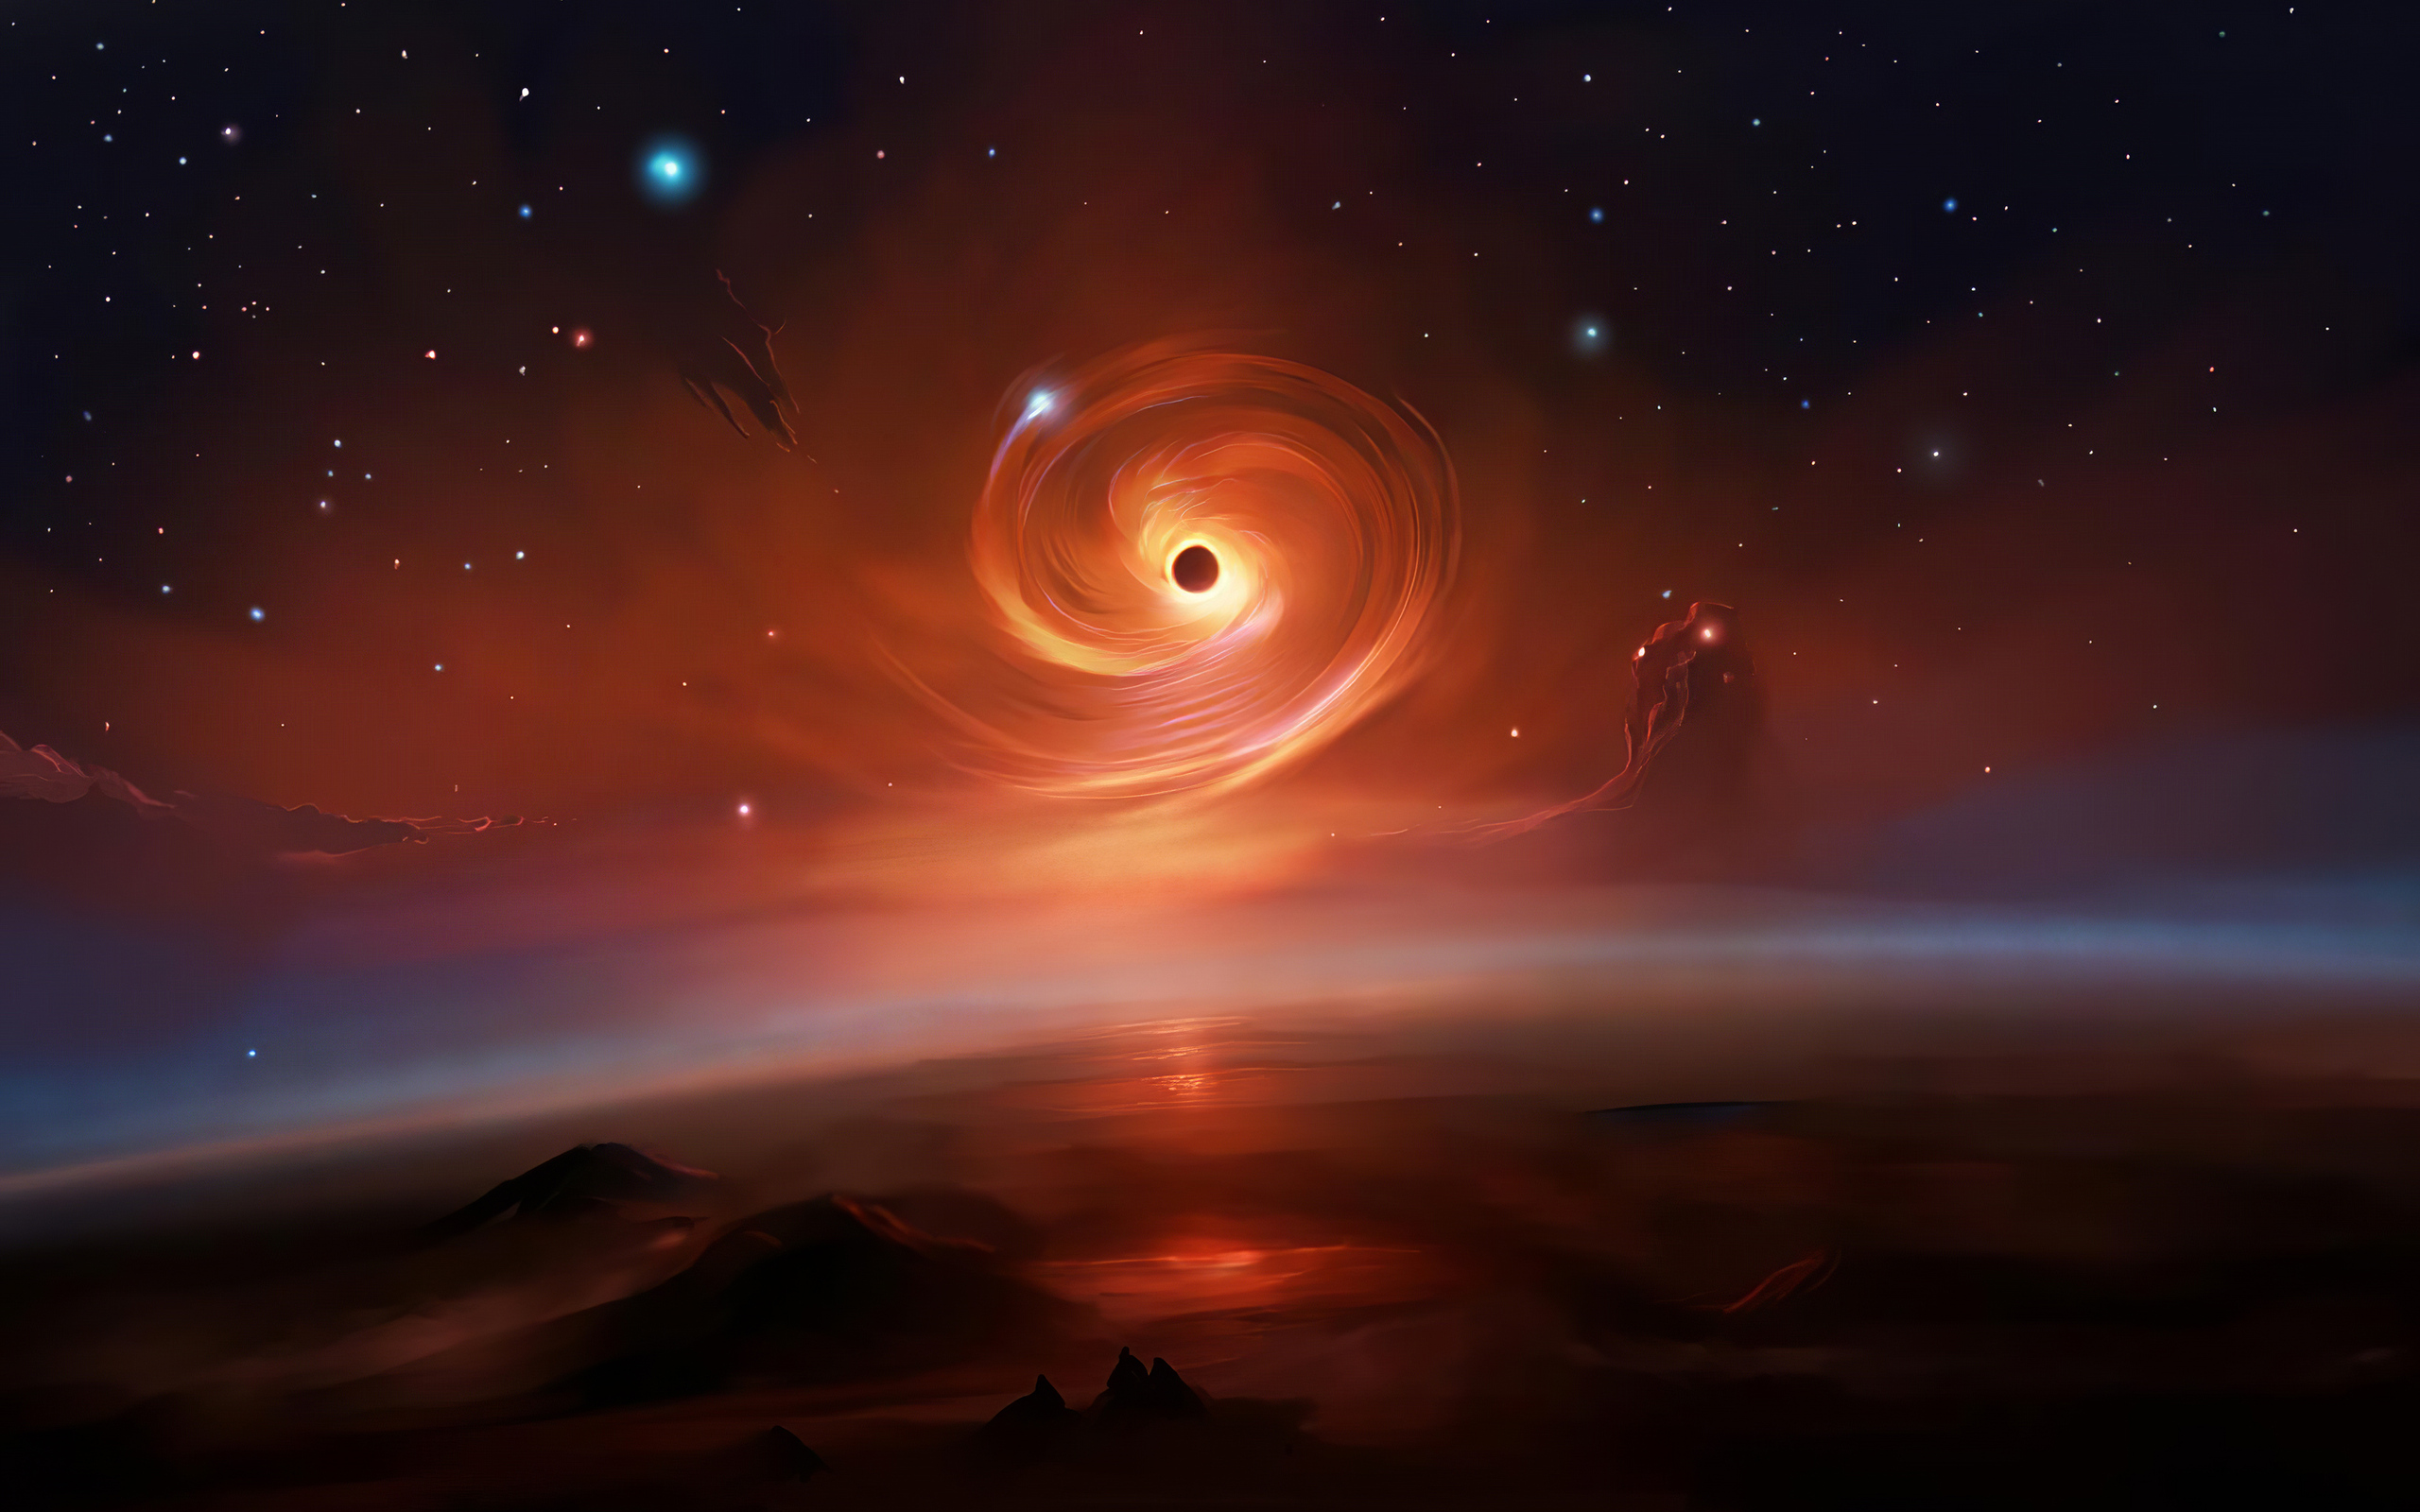 black-hole-art-4k-85.jpg